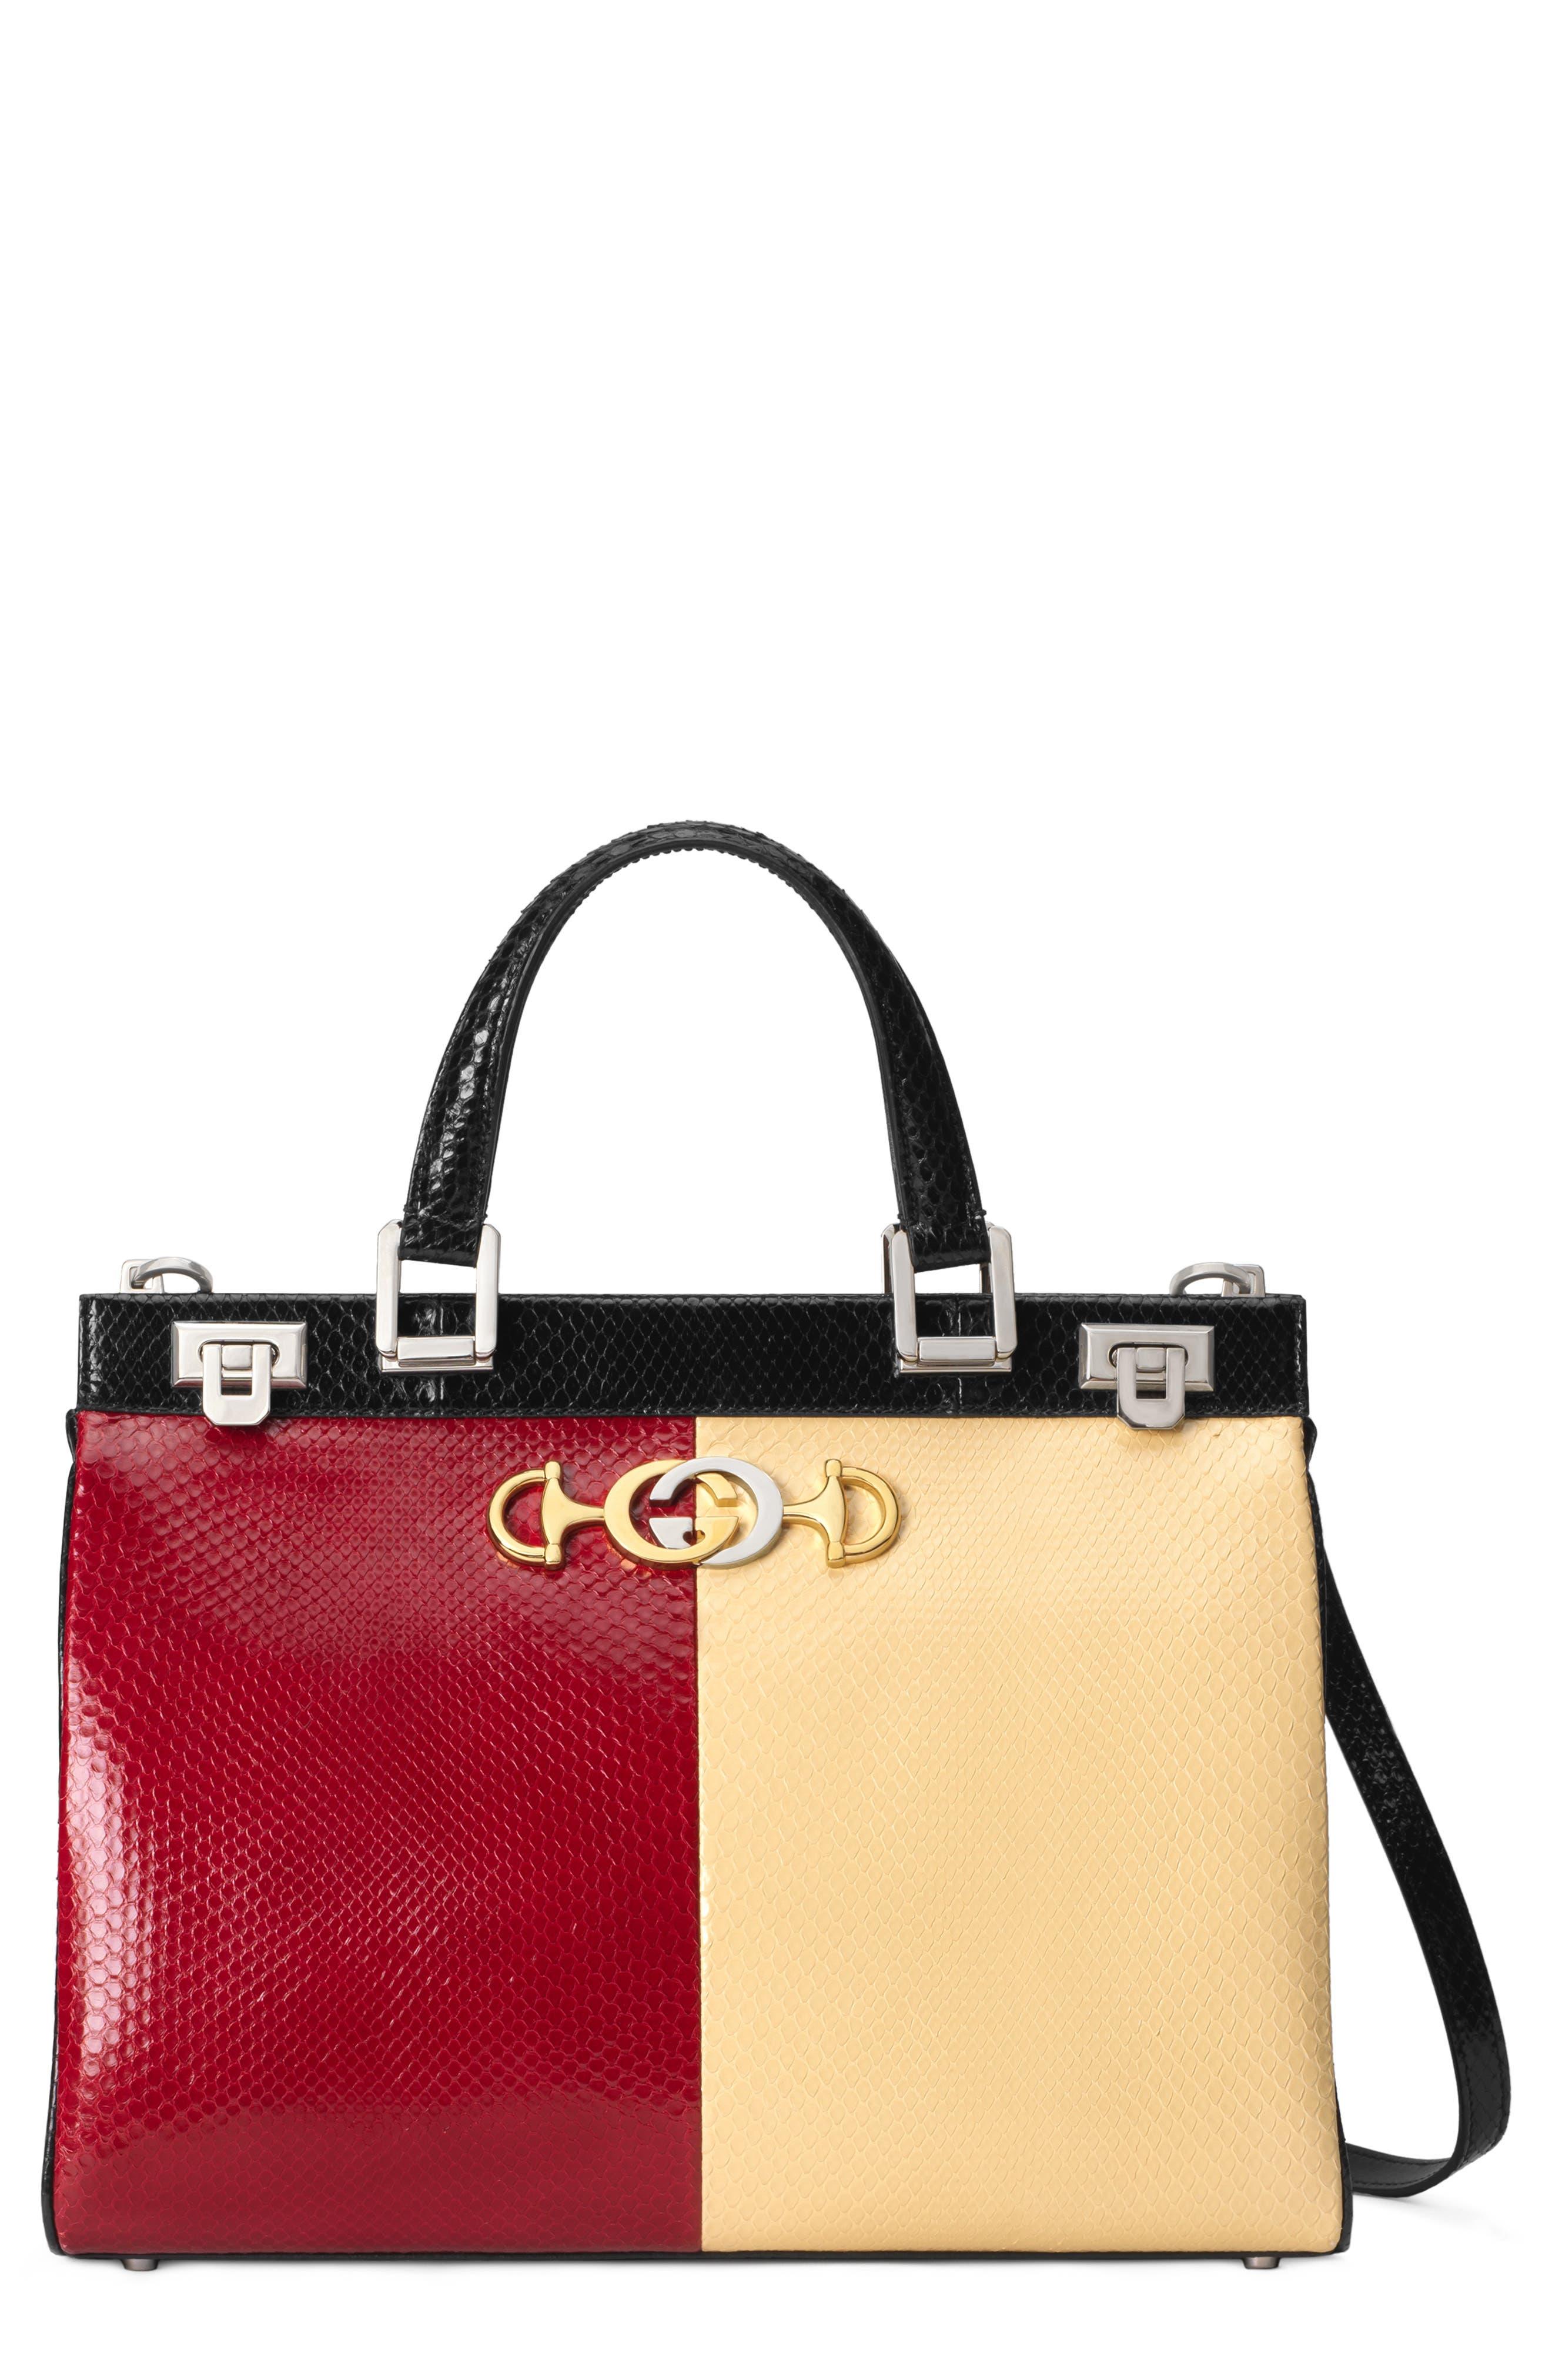 Gucci Bags Medium Zumi Bicolor Genuine Snakeskin Top Handle Leather Bag